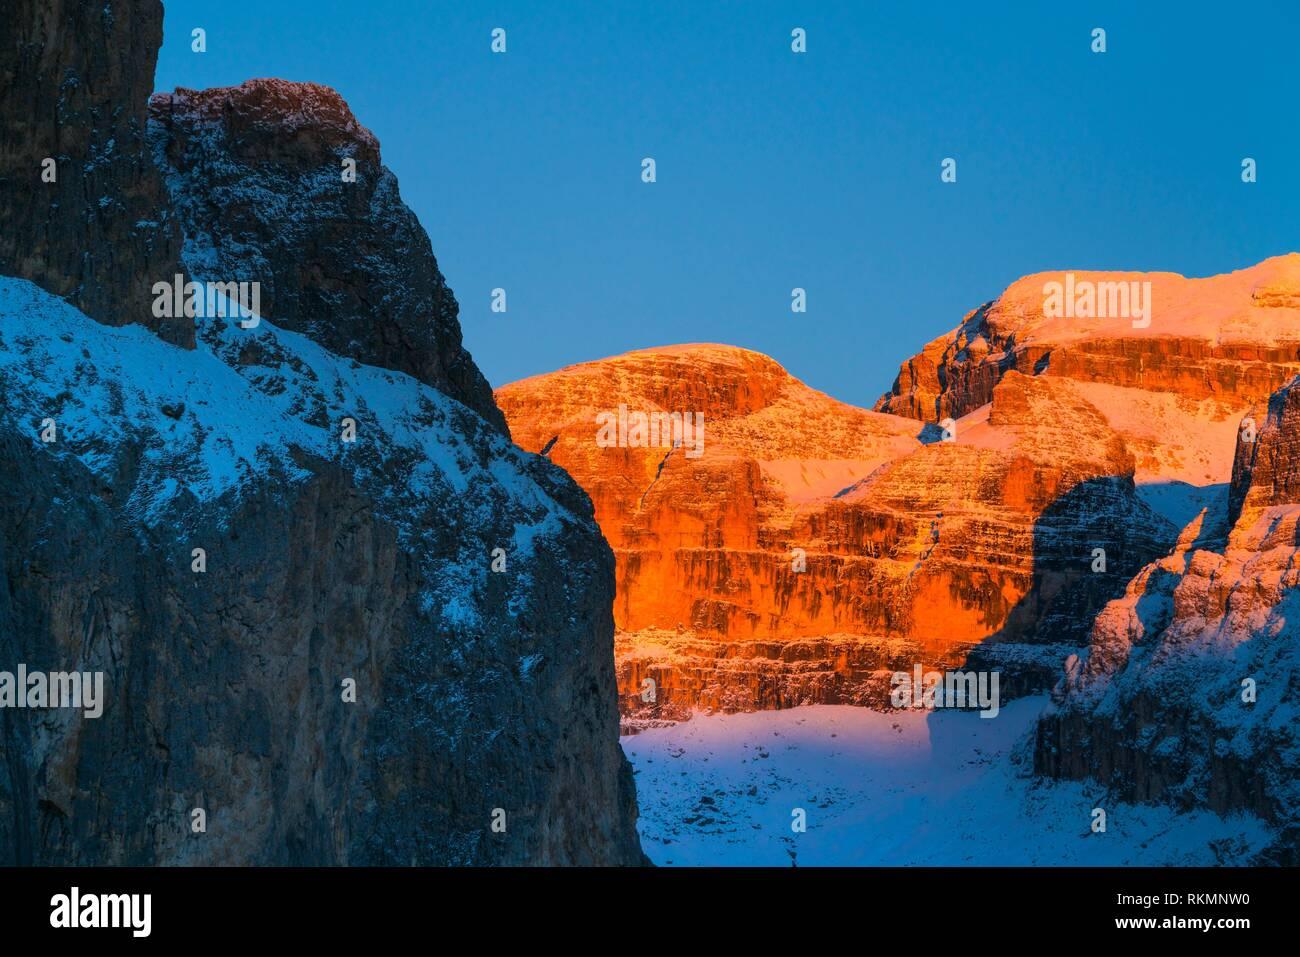 Sella Pass, Dolomites, Unesco World Heritage Site, Italy, Europe. - Stock Image